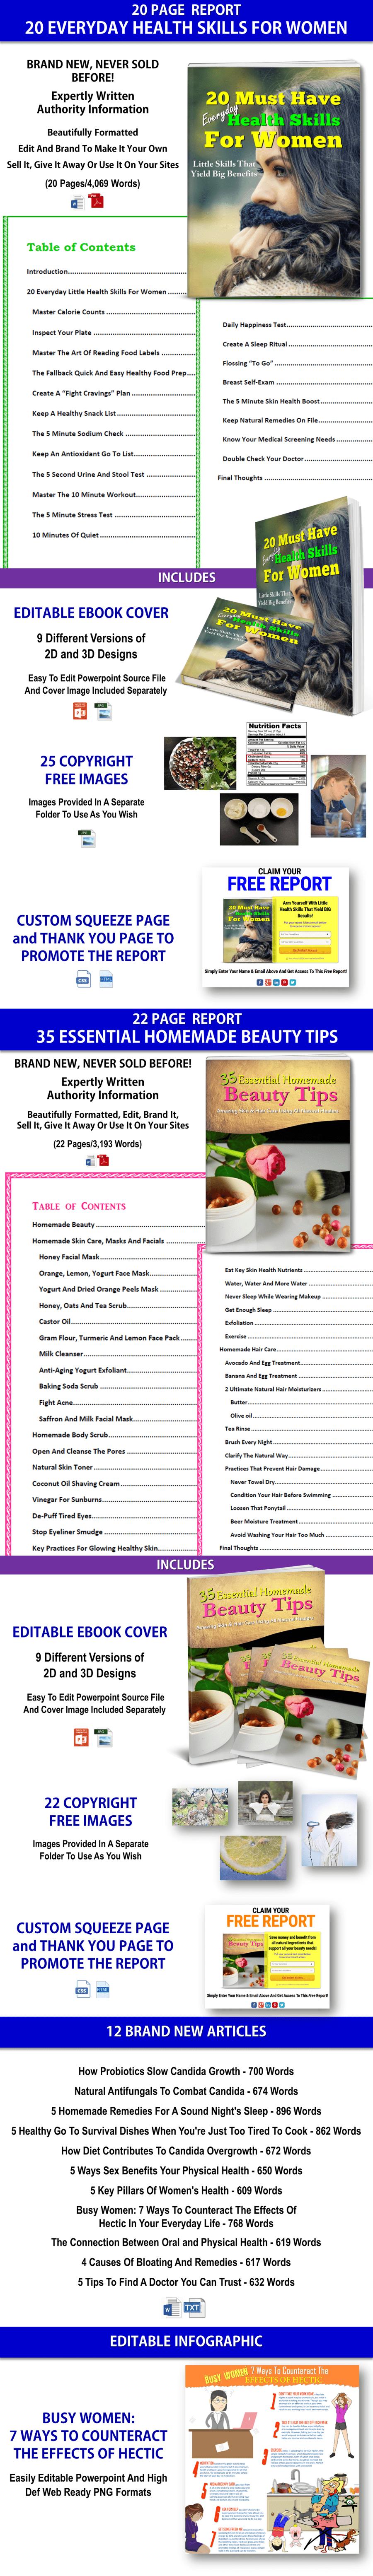 Health Skills And Homemade Beauty Tips PLR